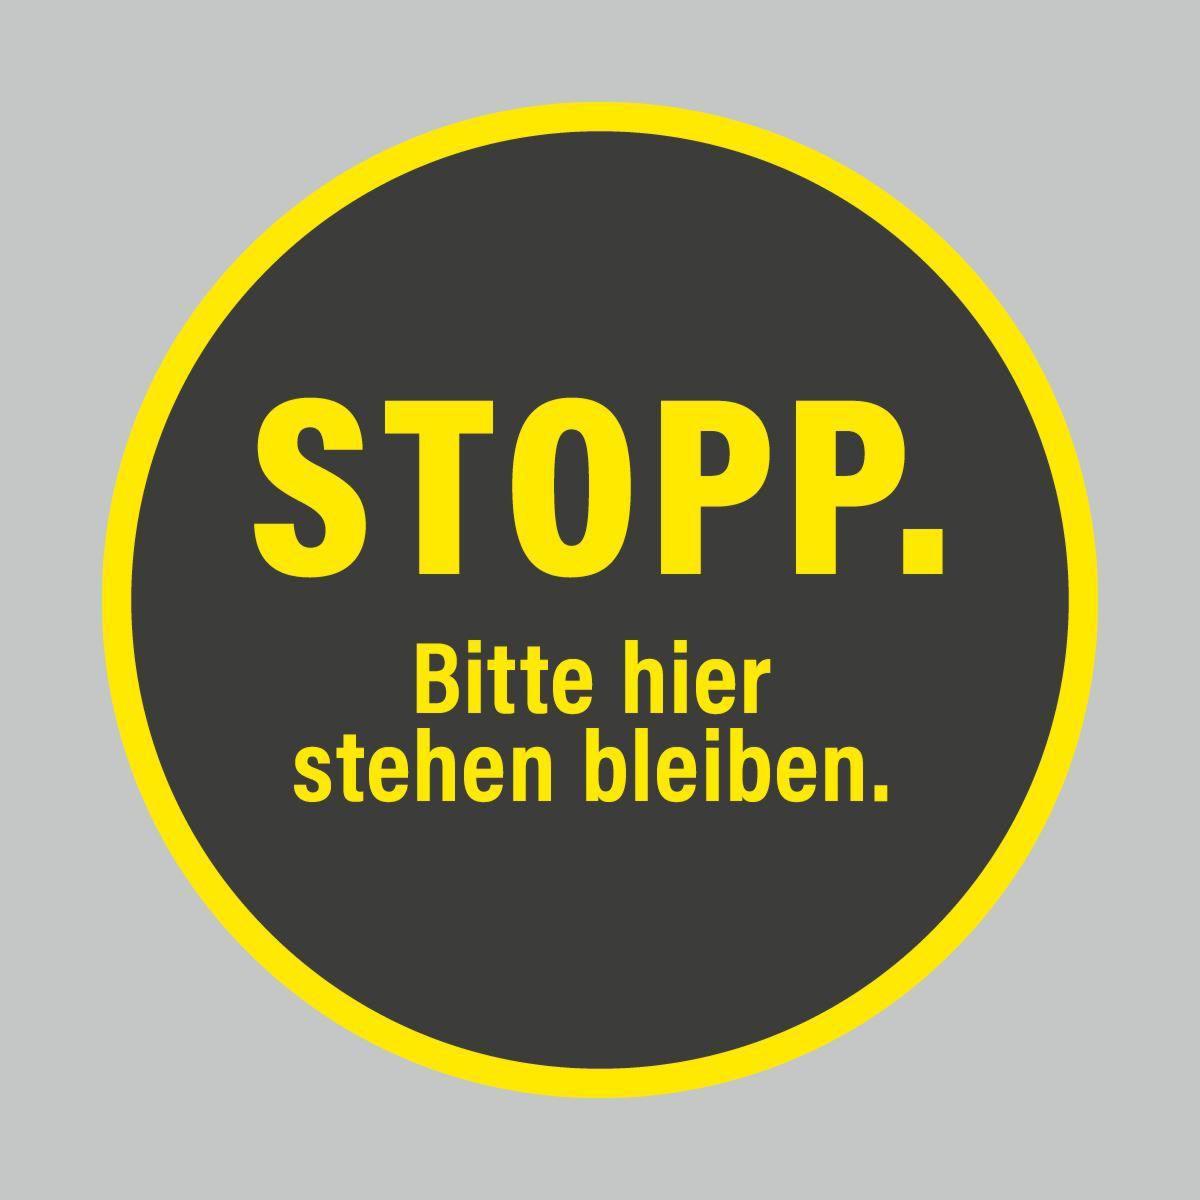 Fußbodenaufkleber, gelb-schwarz, Ø 48cm – Stopp